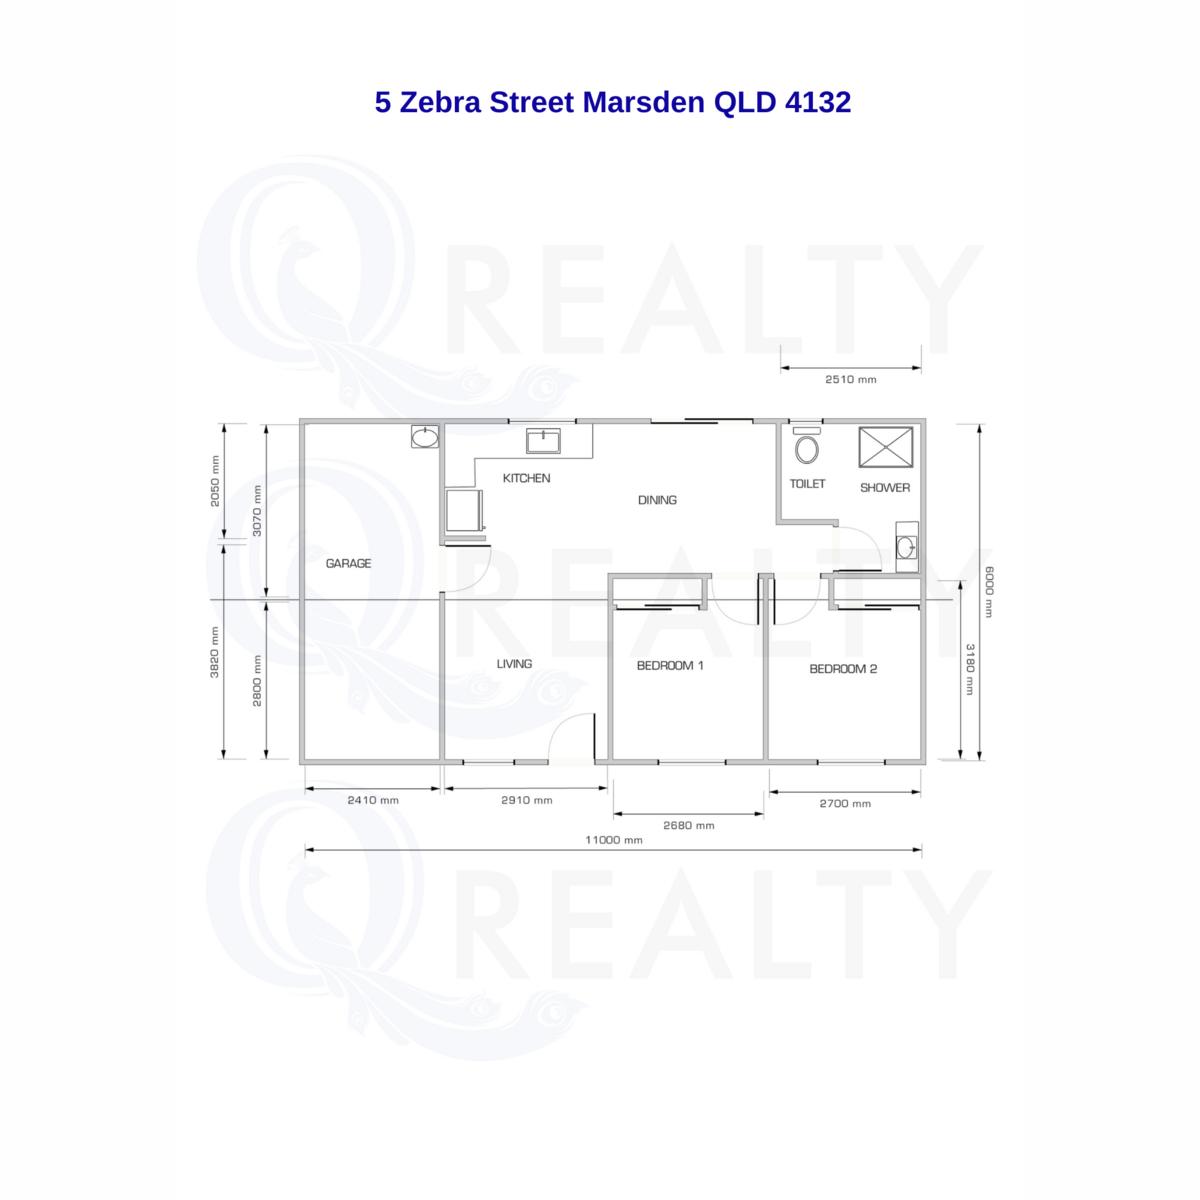 5 Zebra Street, Marsden  QLD  4132